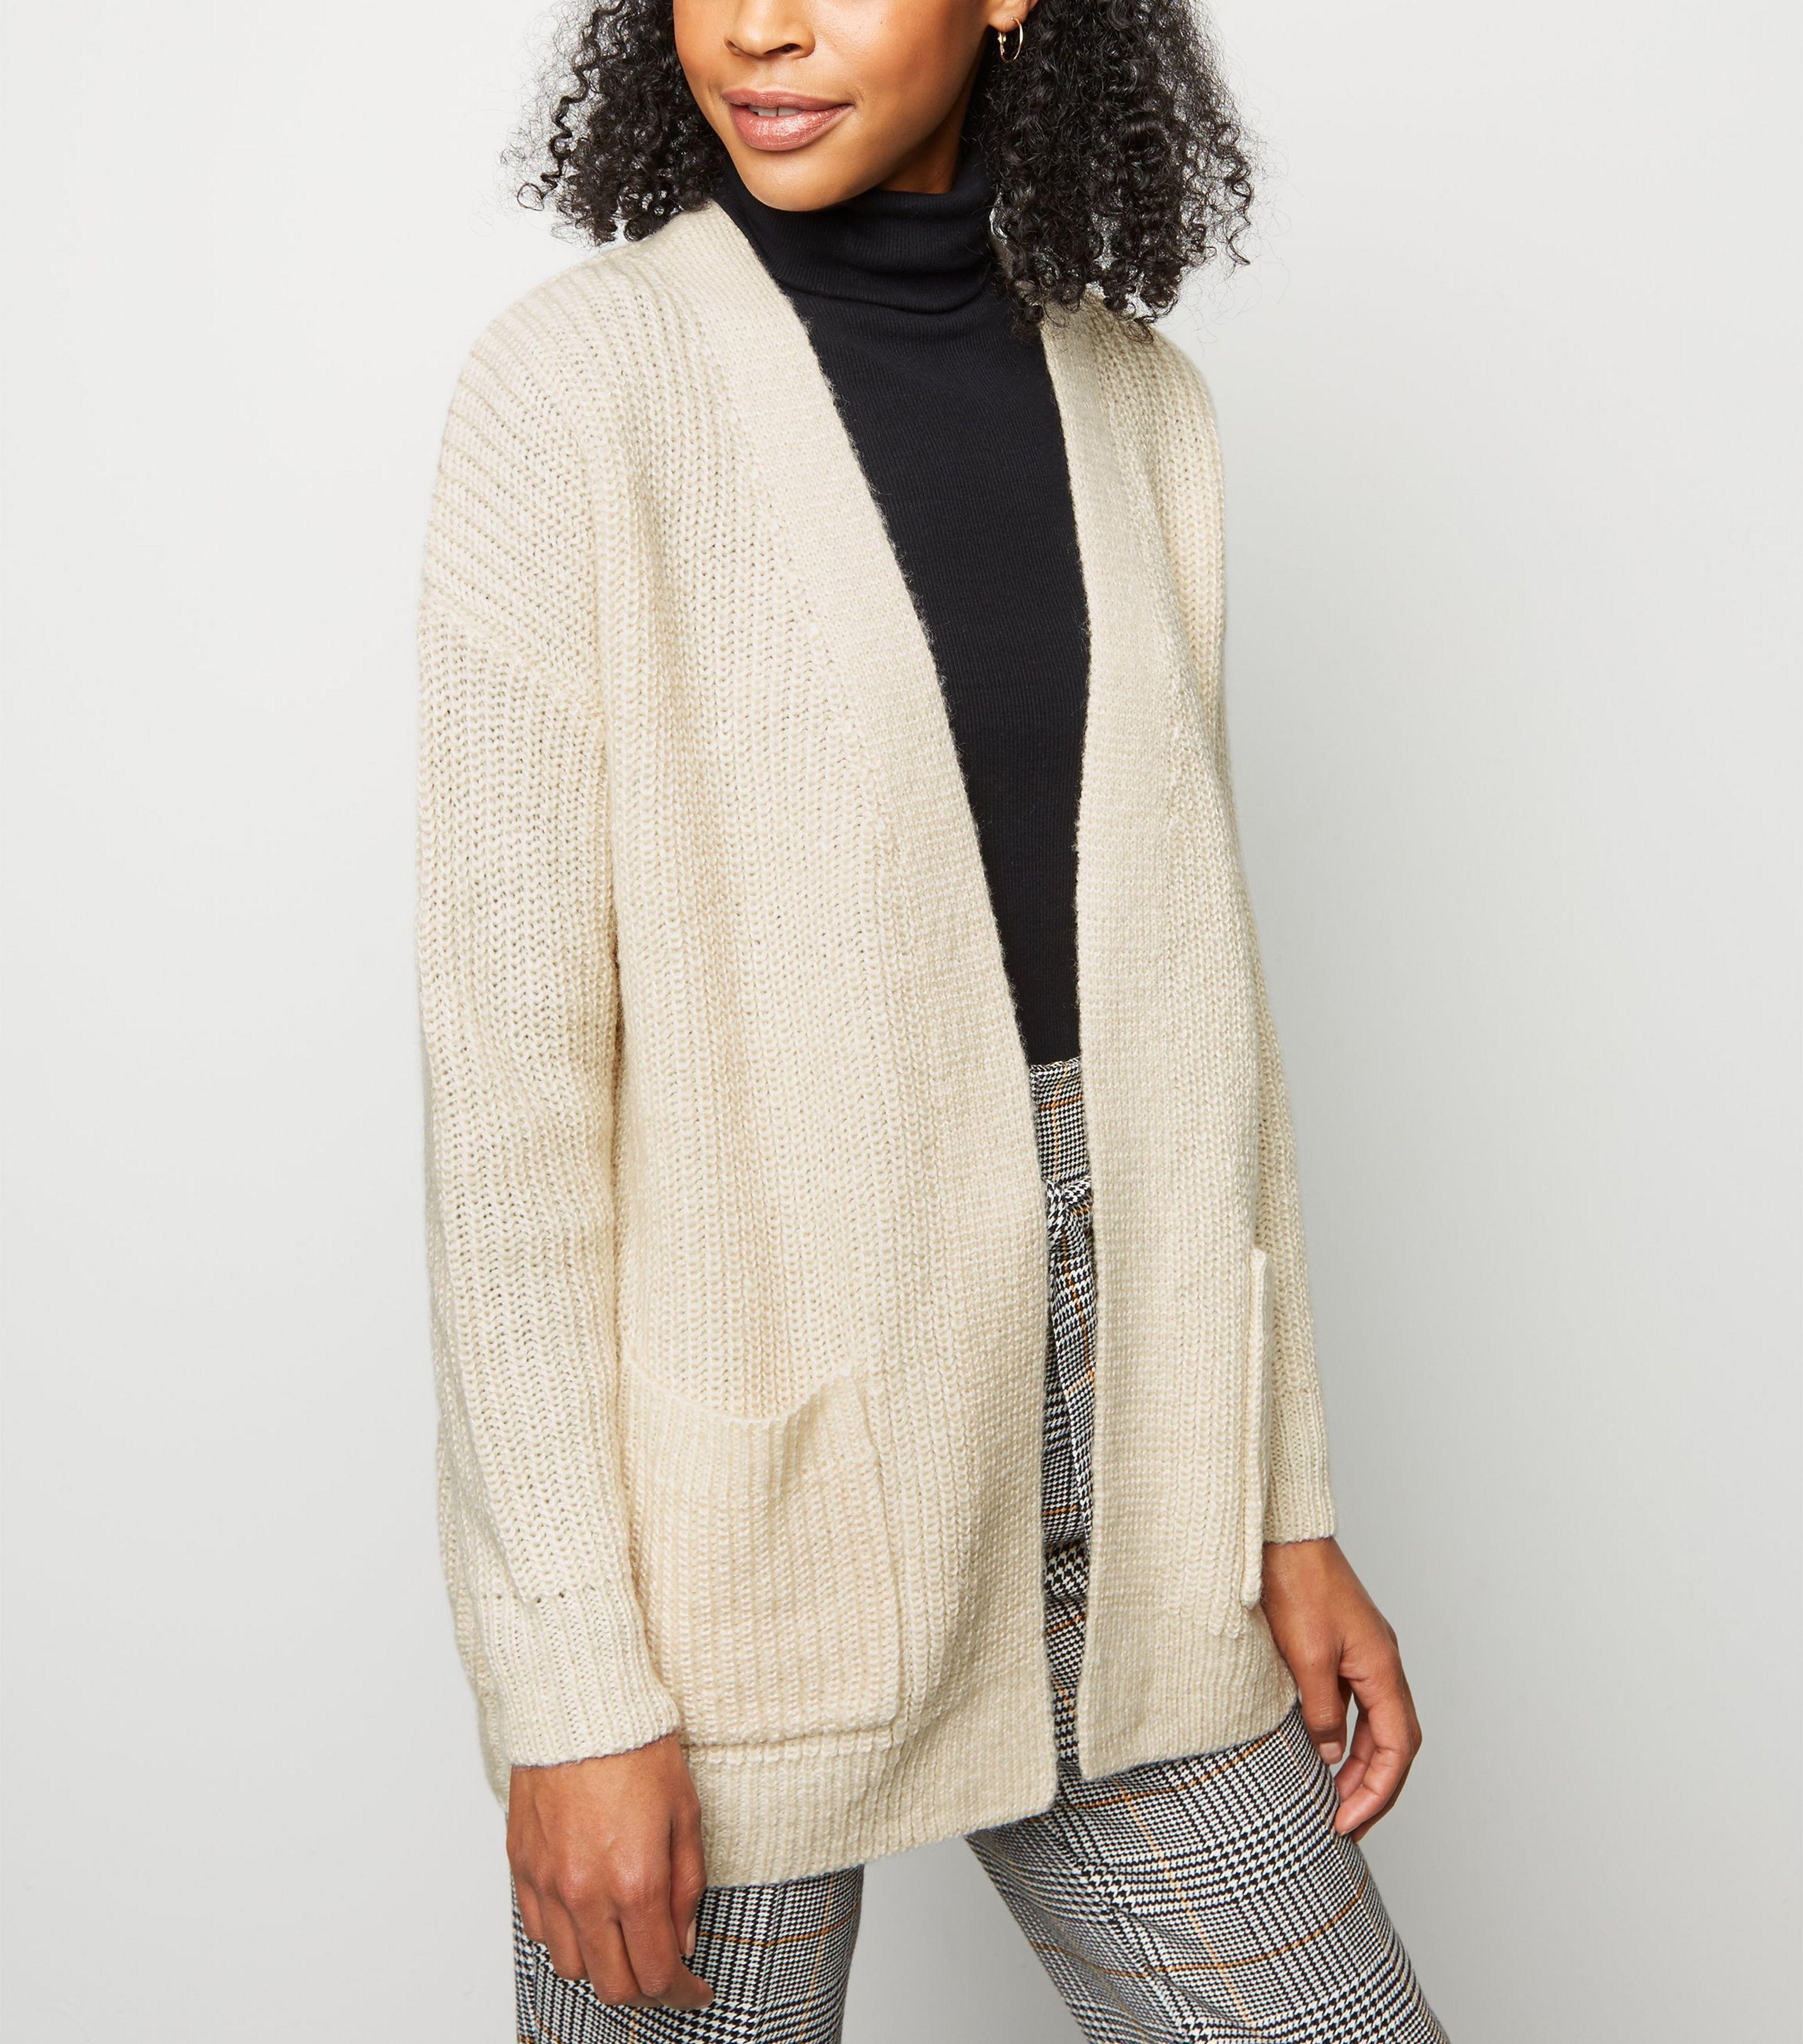 In Cardigan Knit Natural Oversized Cream New Lyst Look qXwR11U